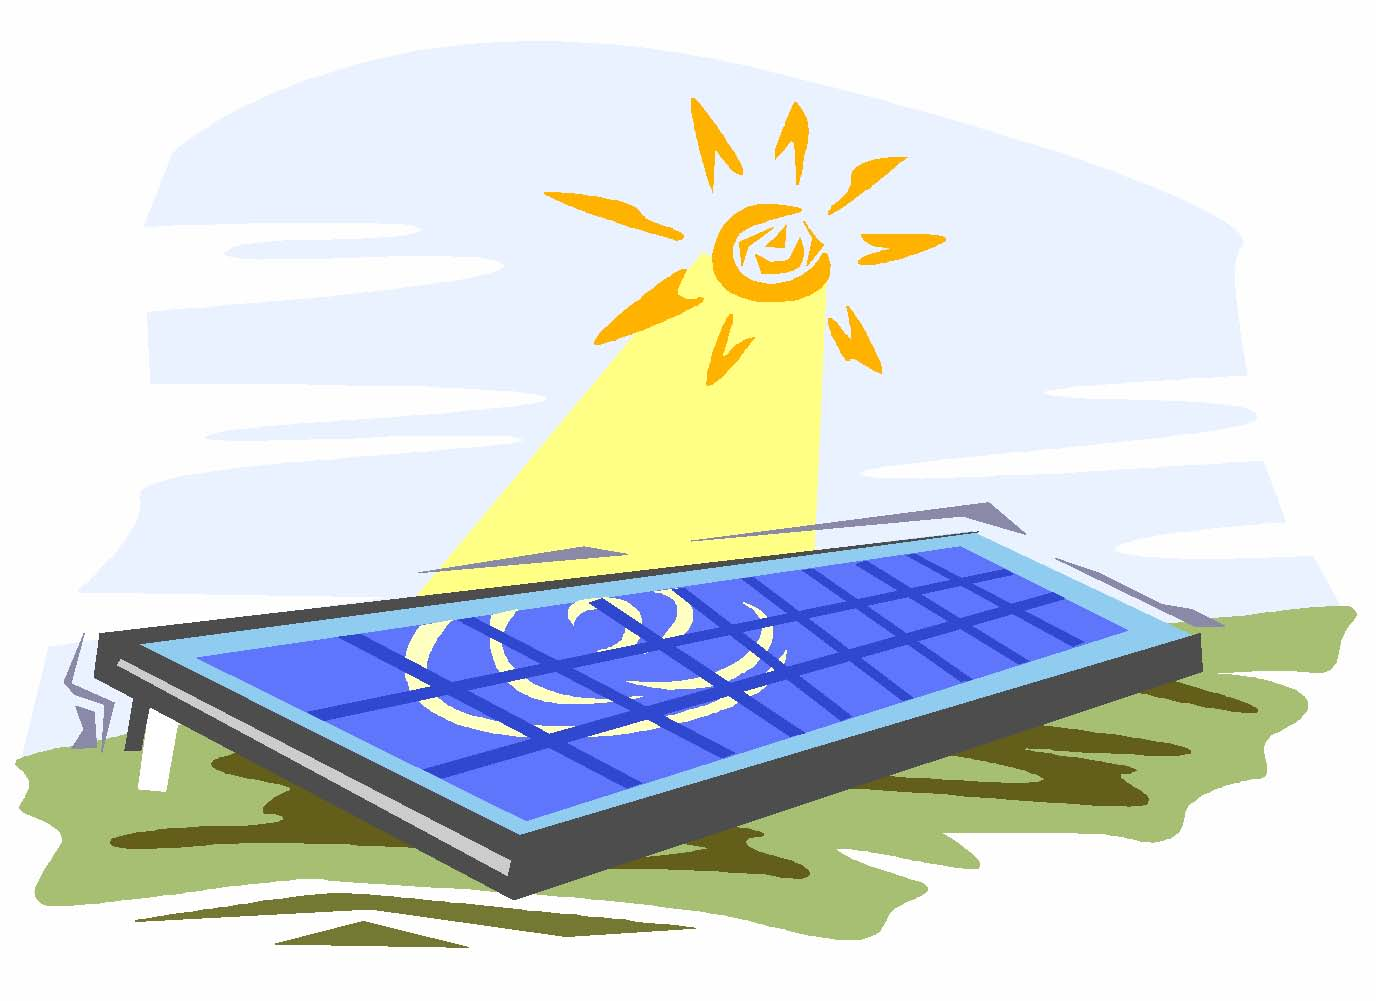 Solar Panel Clip Art Jpg-Solar Panel Clip Art Jpg-11